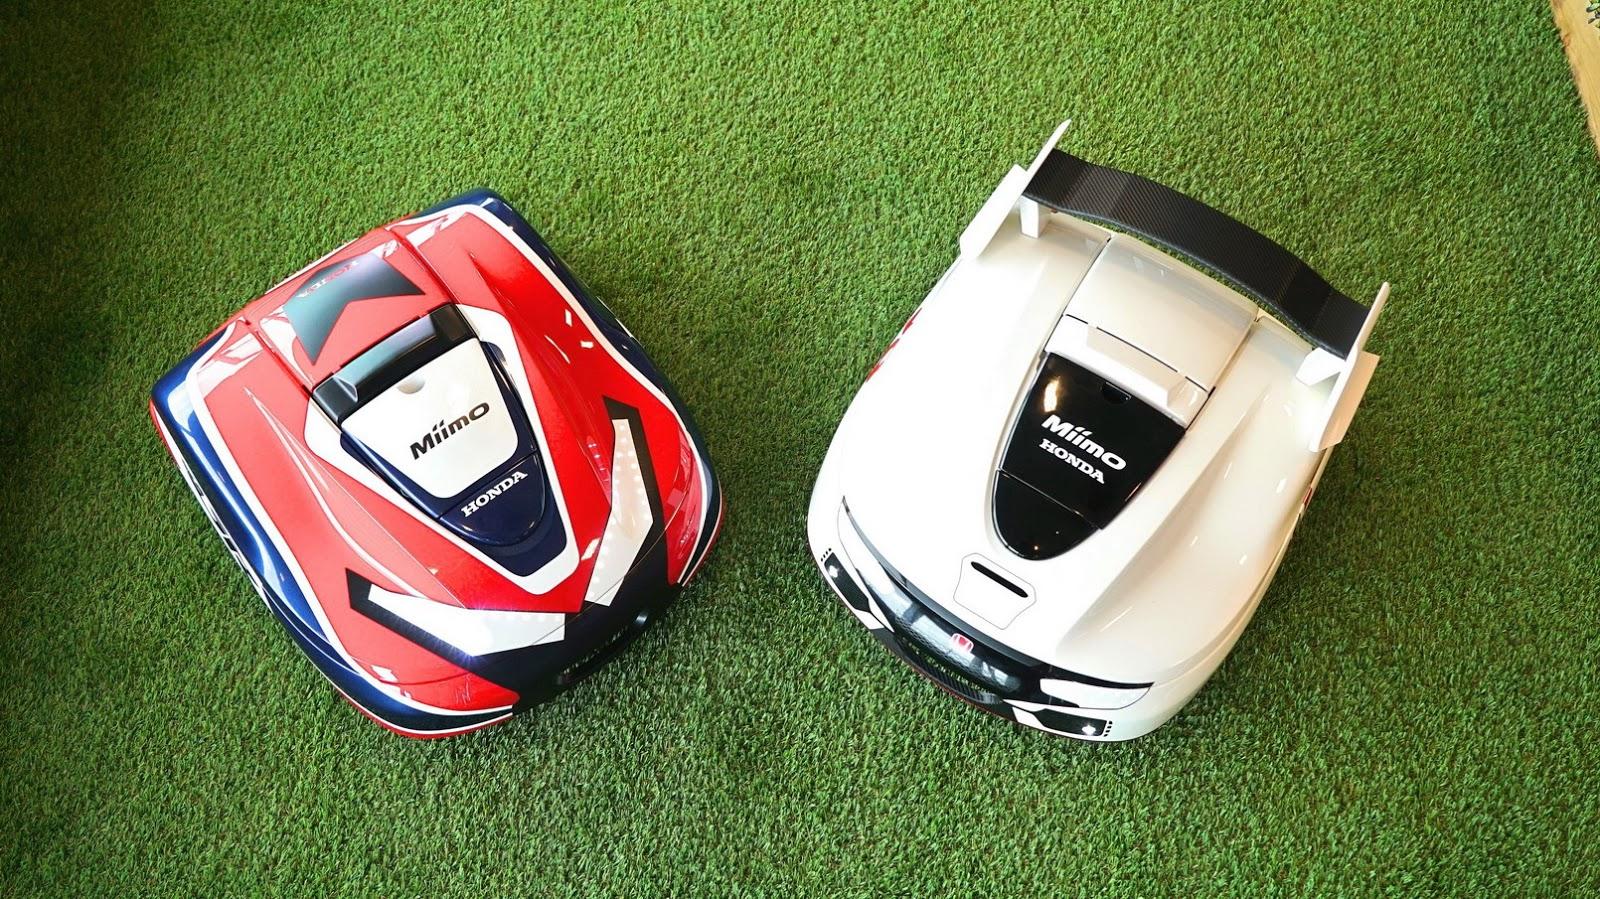 Honda-Robo-Mower-8